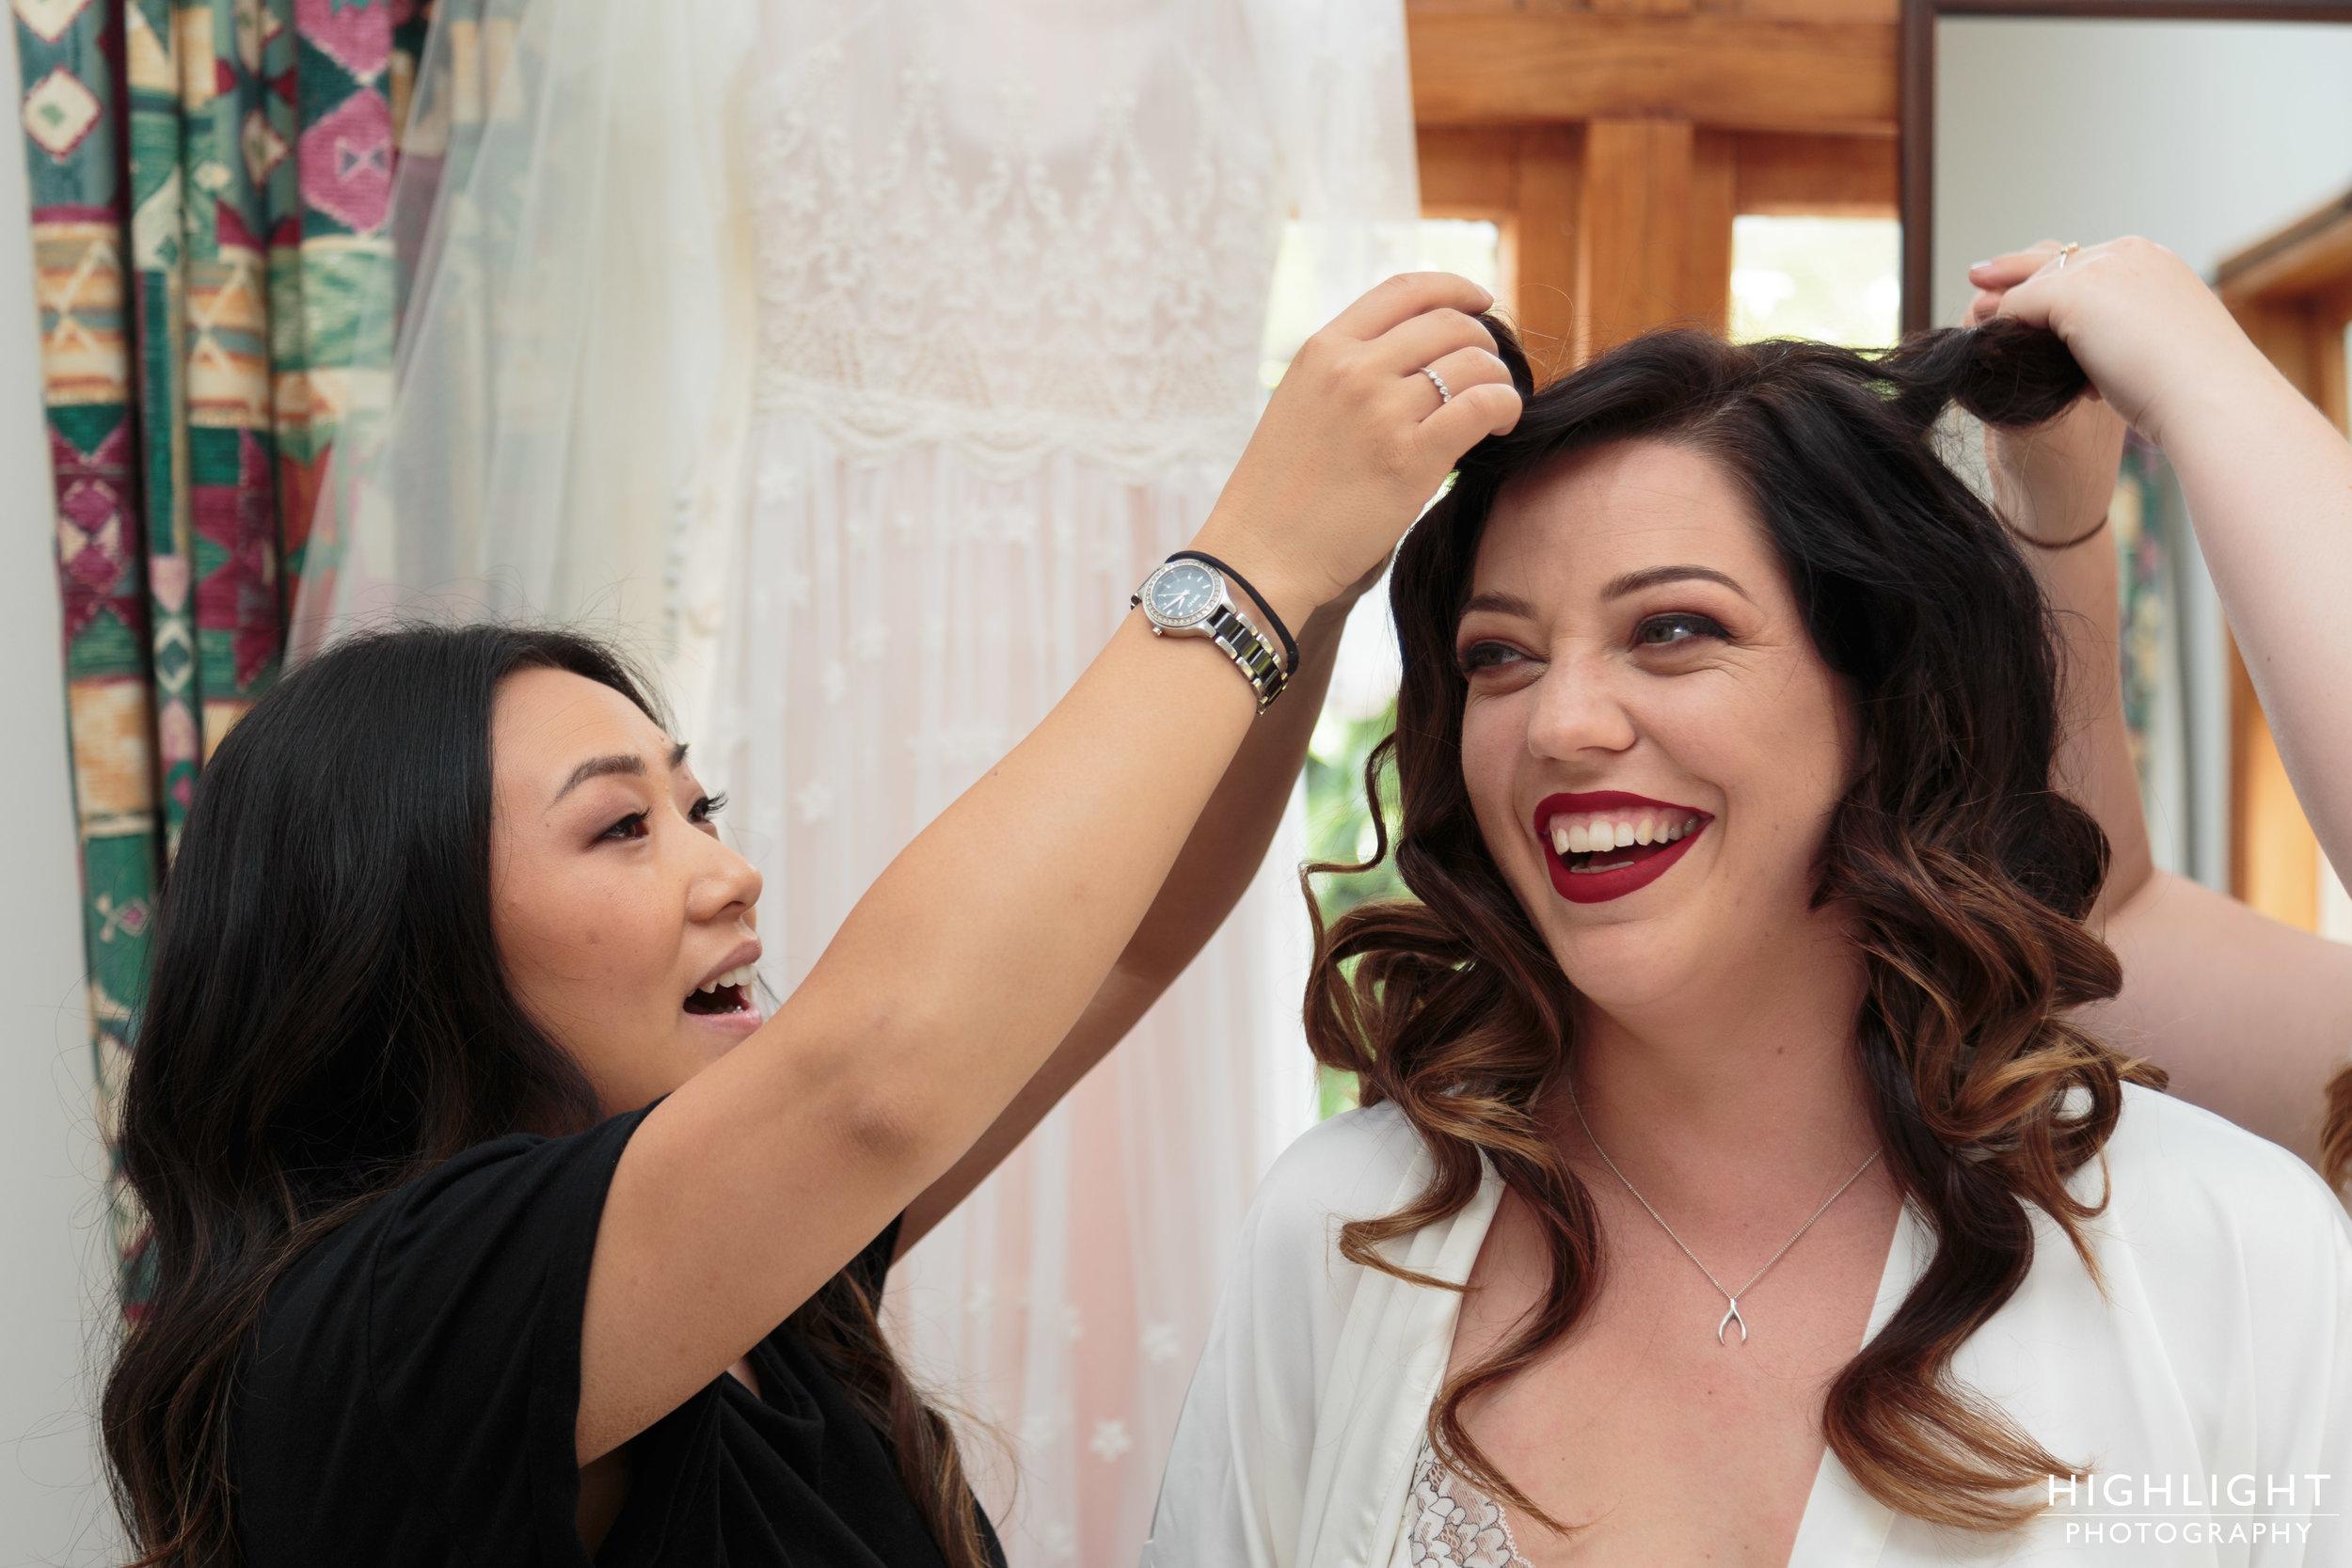 highlight-wedding-photography-new-zealand-makoura-lodge-wedding-9.jpg